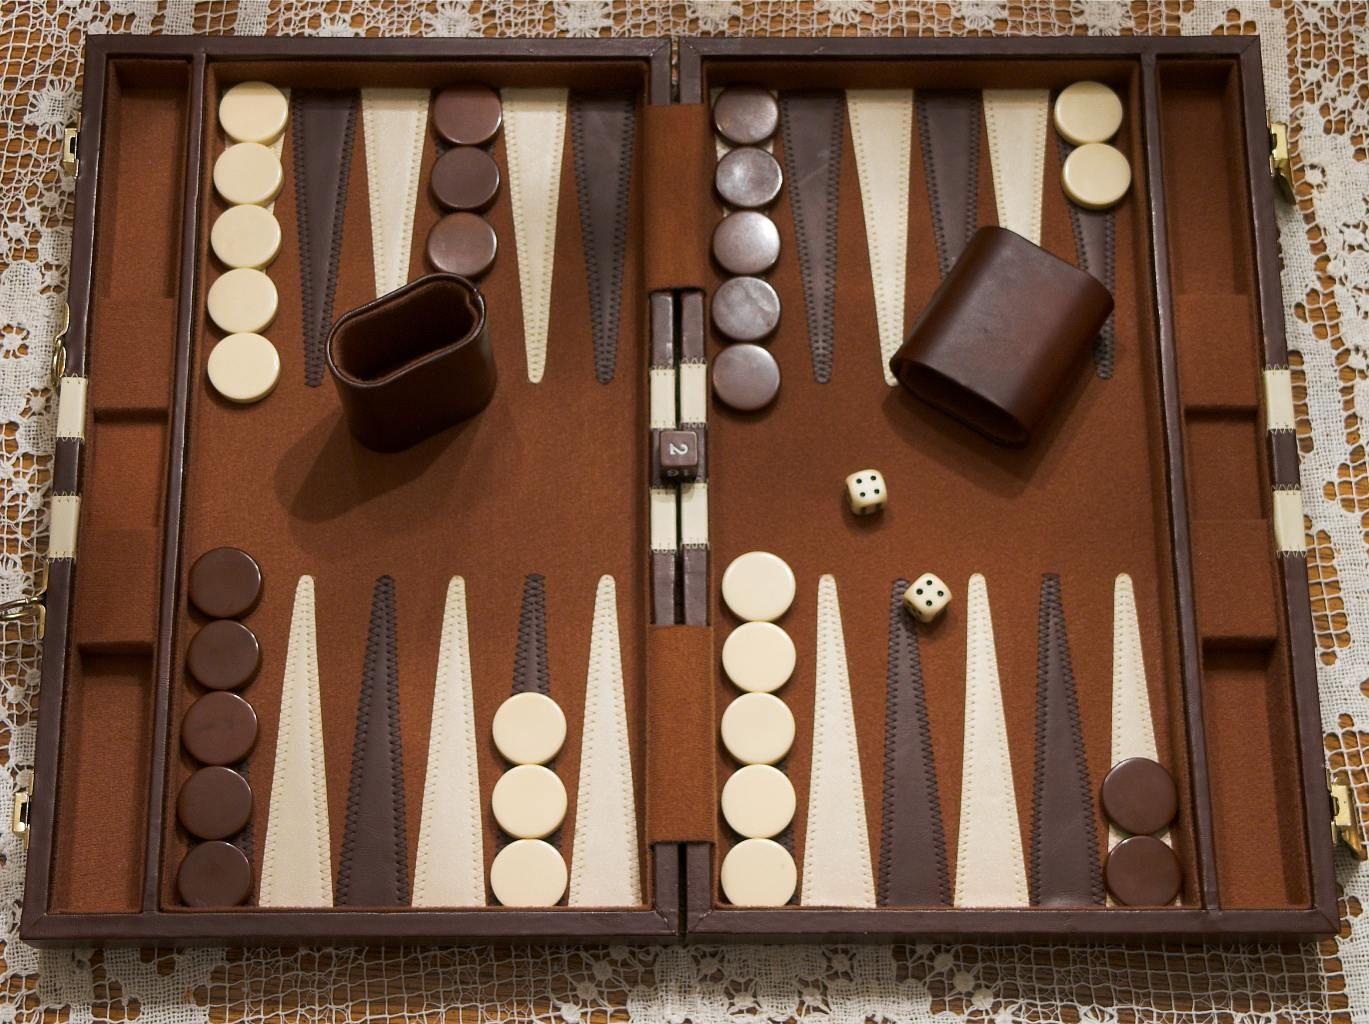 Jamaican Gambling How To Play Backgammon Old Board Games Board